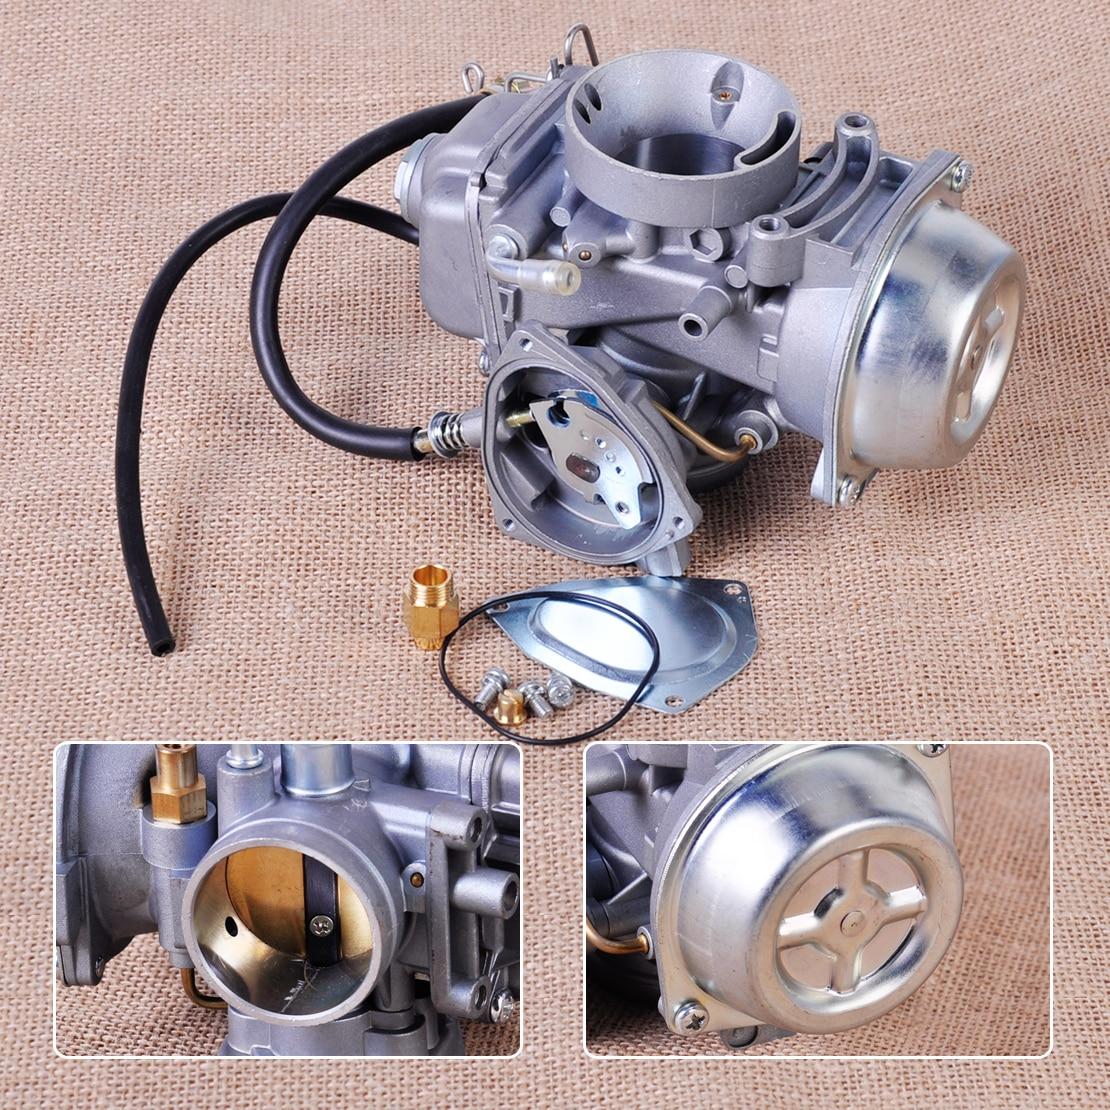 performance carb carby carburetor fits polaris sportsman 500 1999 2001 duse rse CITALL Carburetor Carb Assembly Fit For Polaris Sportsman 500 4X4 HO AR1368CA161RA 3131453 3131567 3131707 3131712 3131742